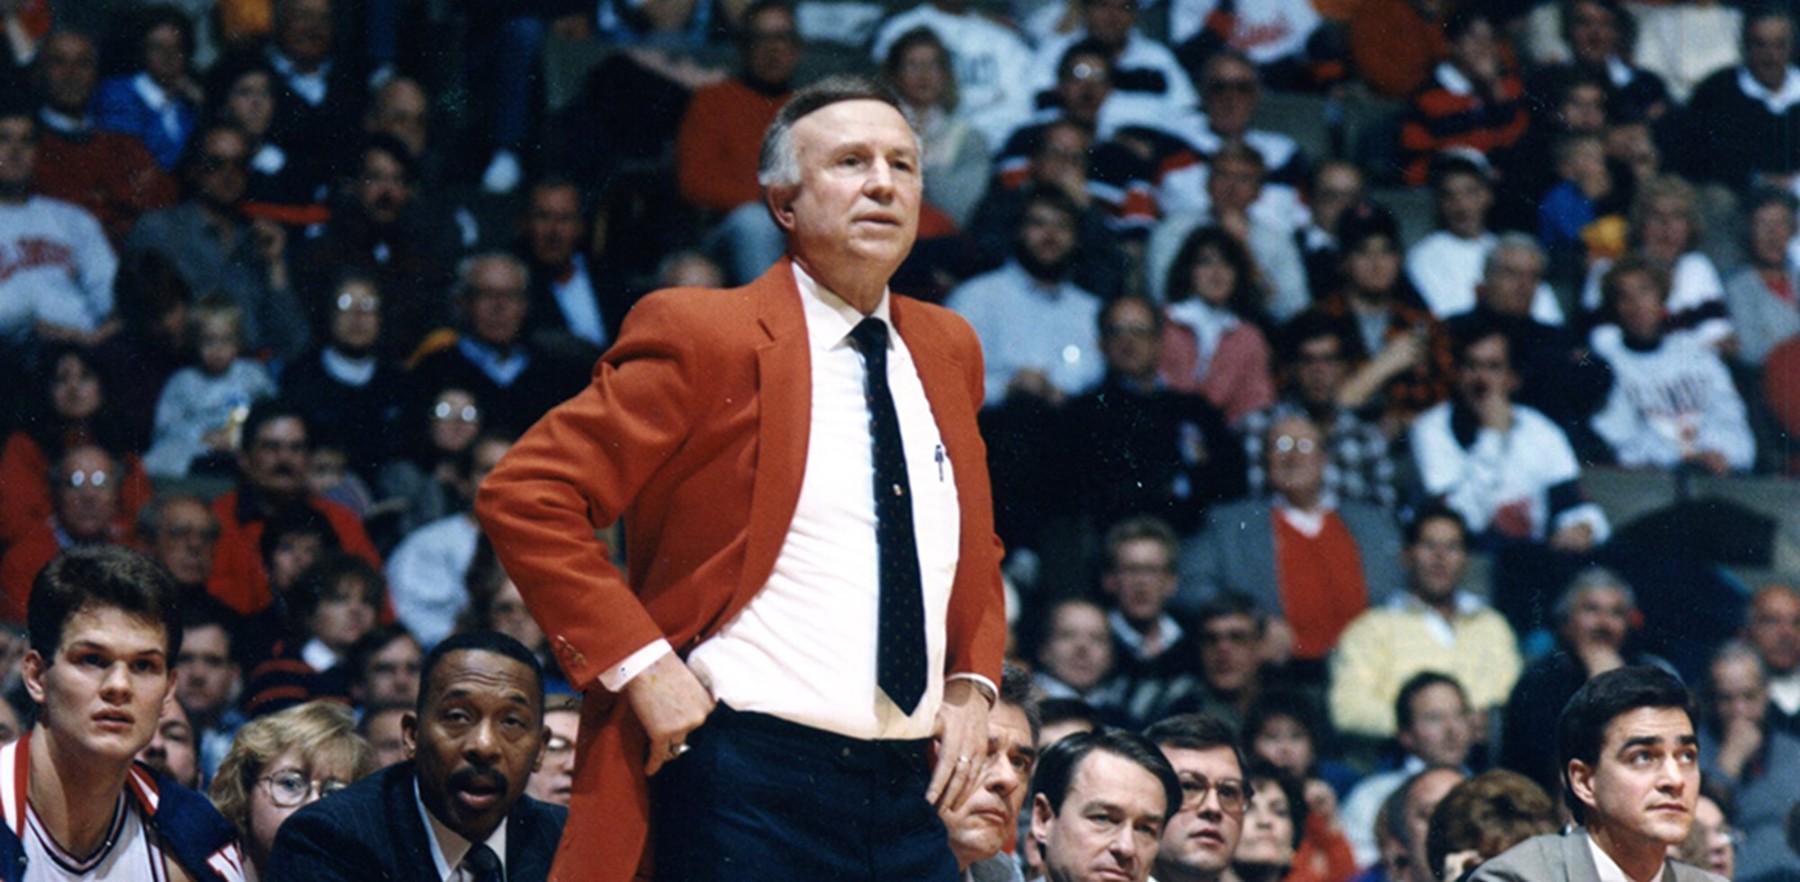 Lou Henson coaching in his signature orange blazer